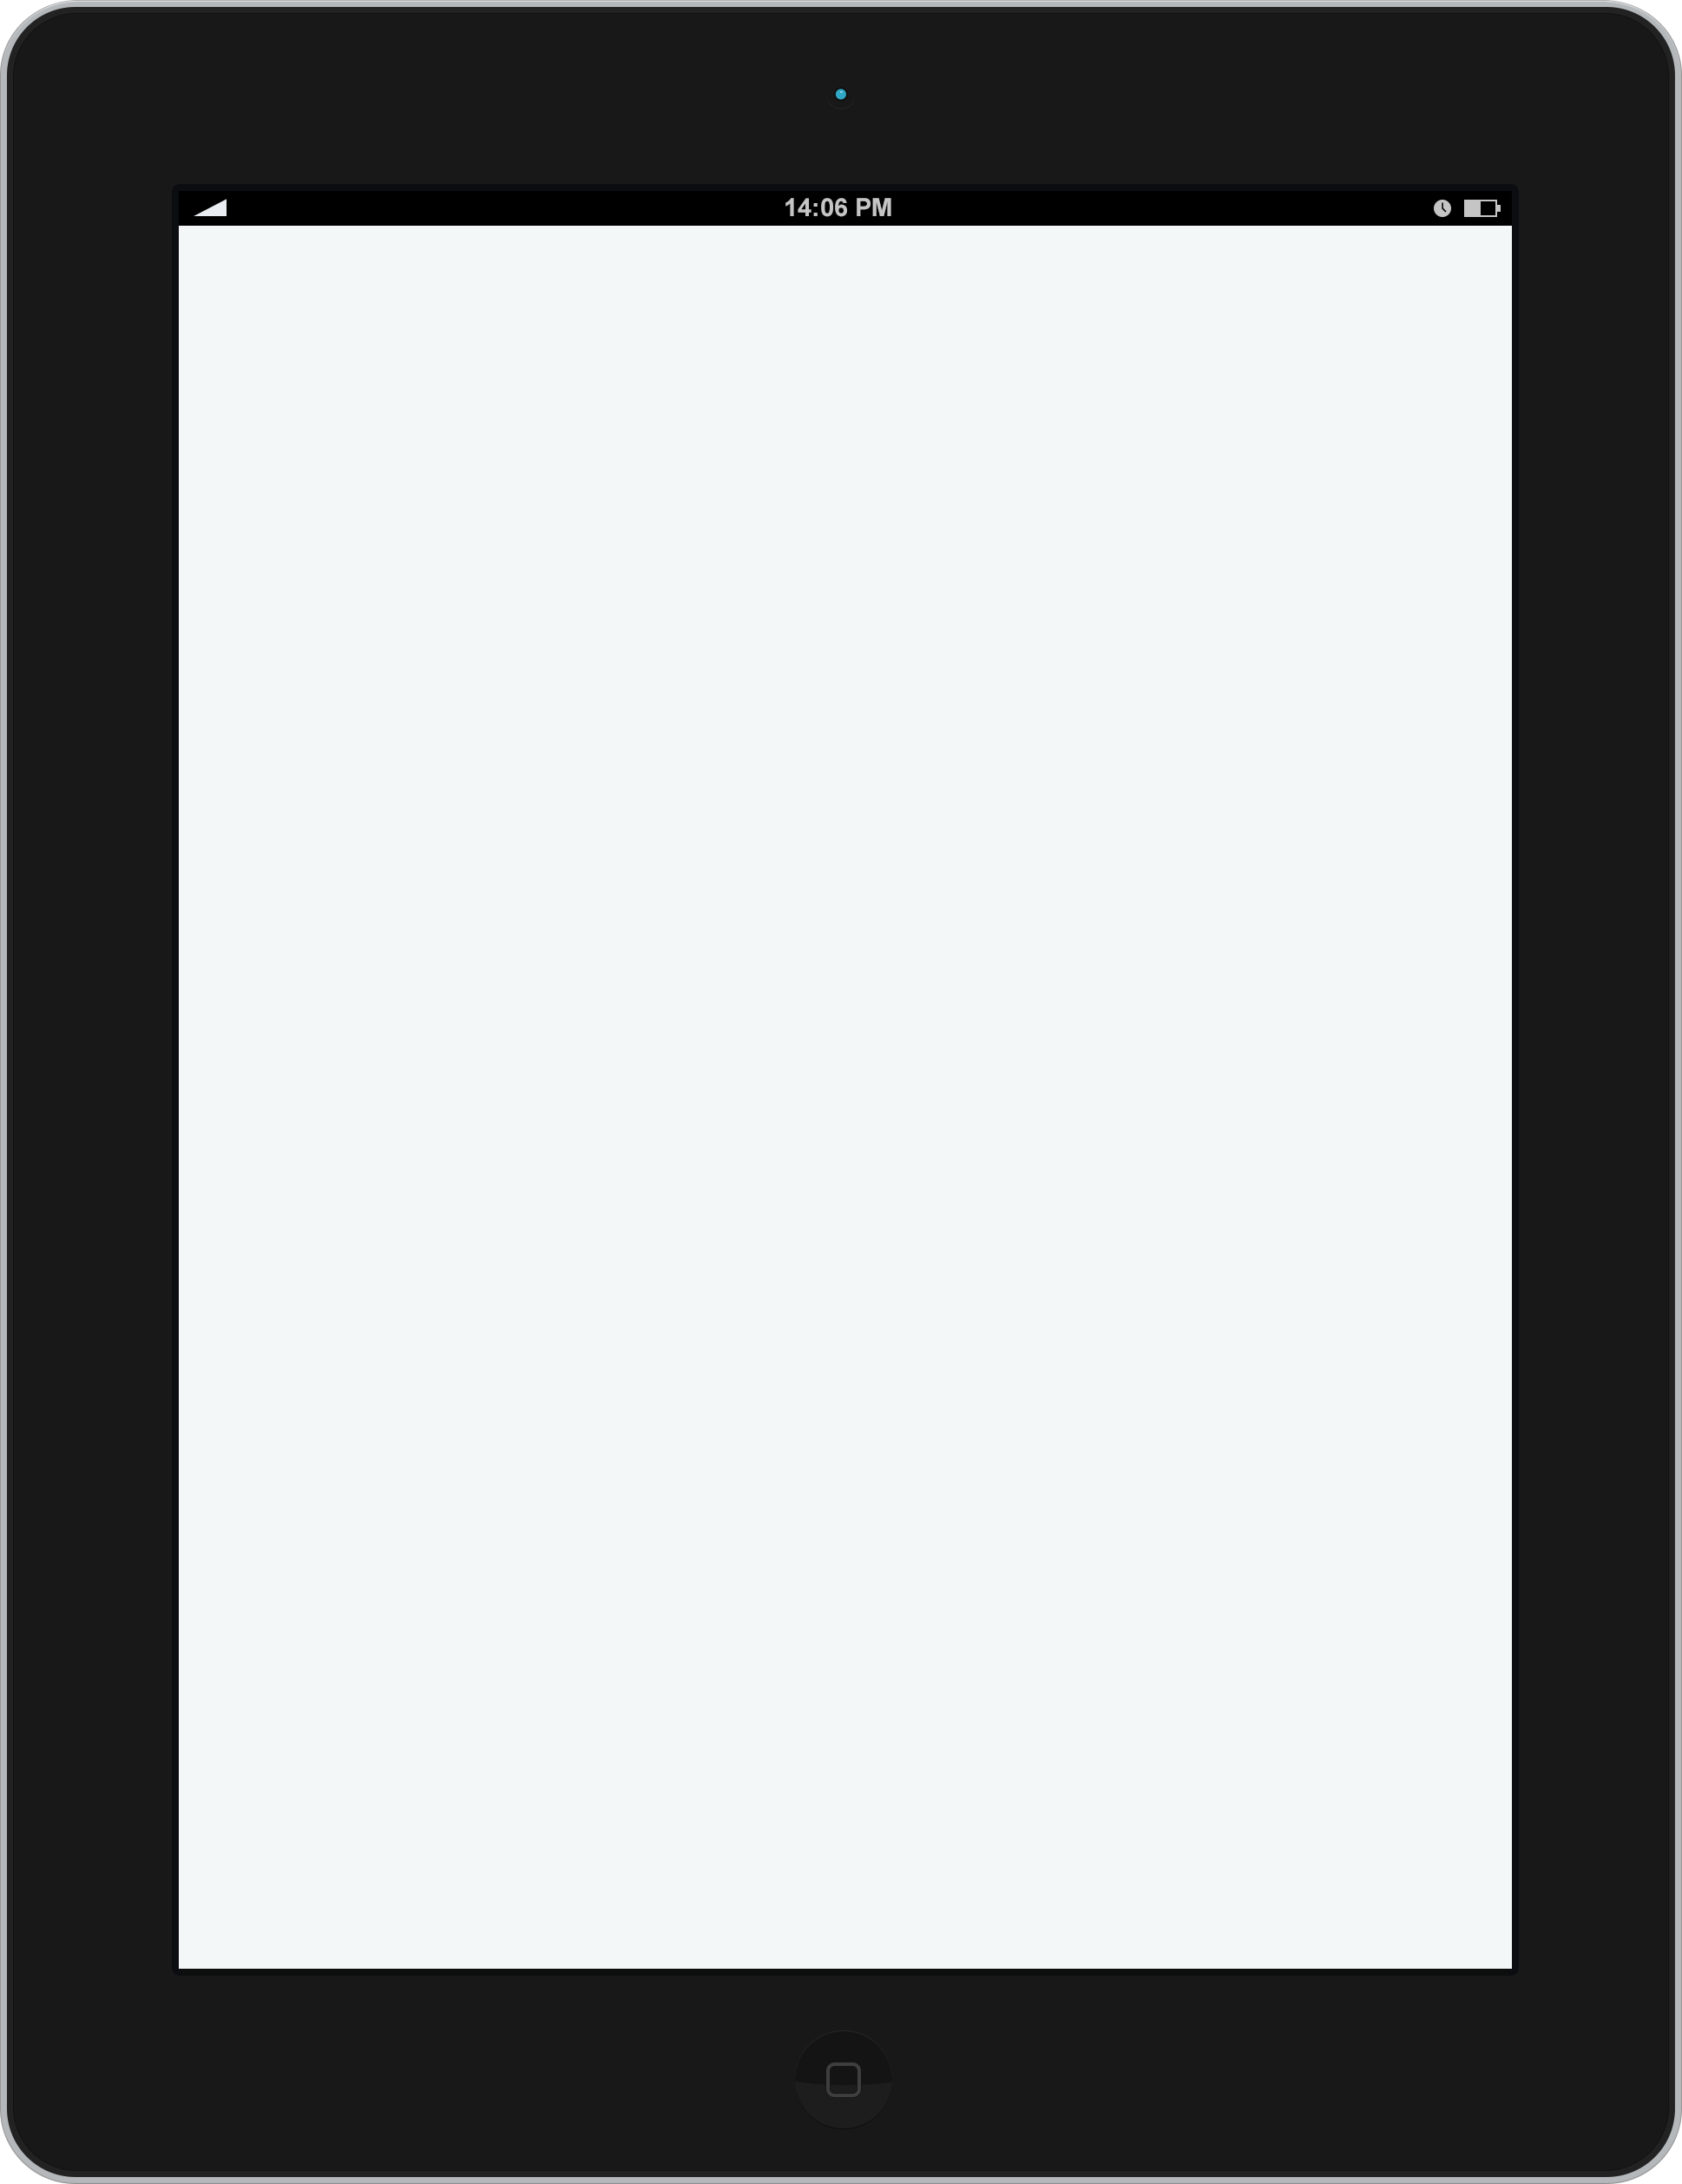 Blank Slate on an Ipad